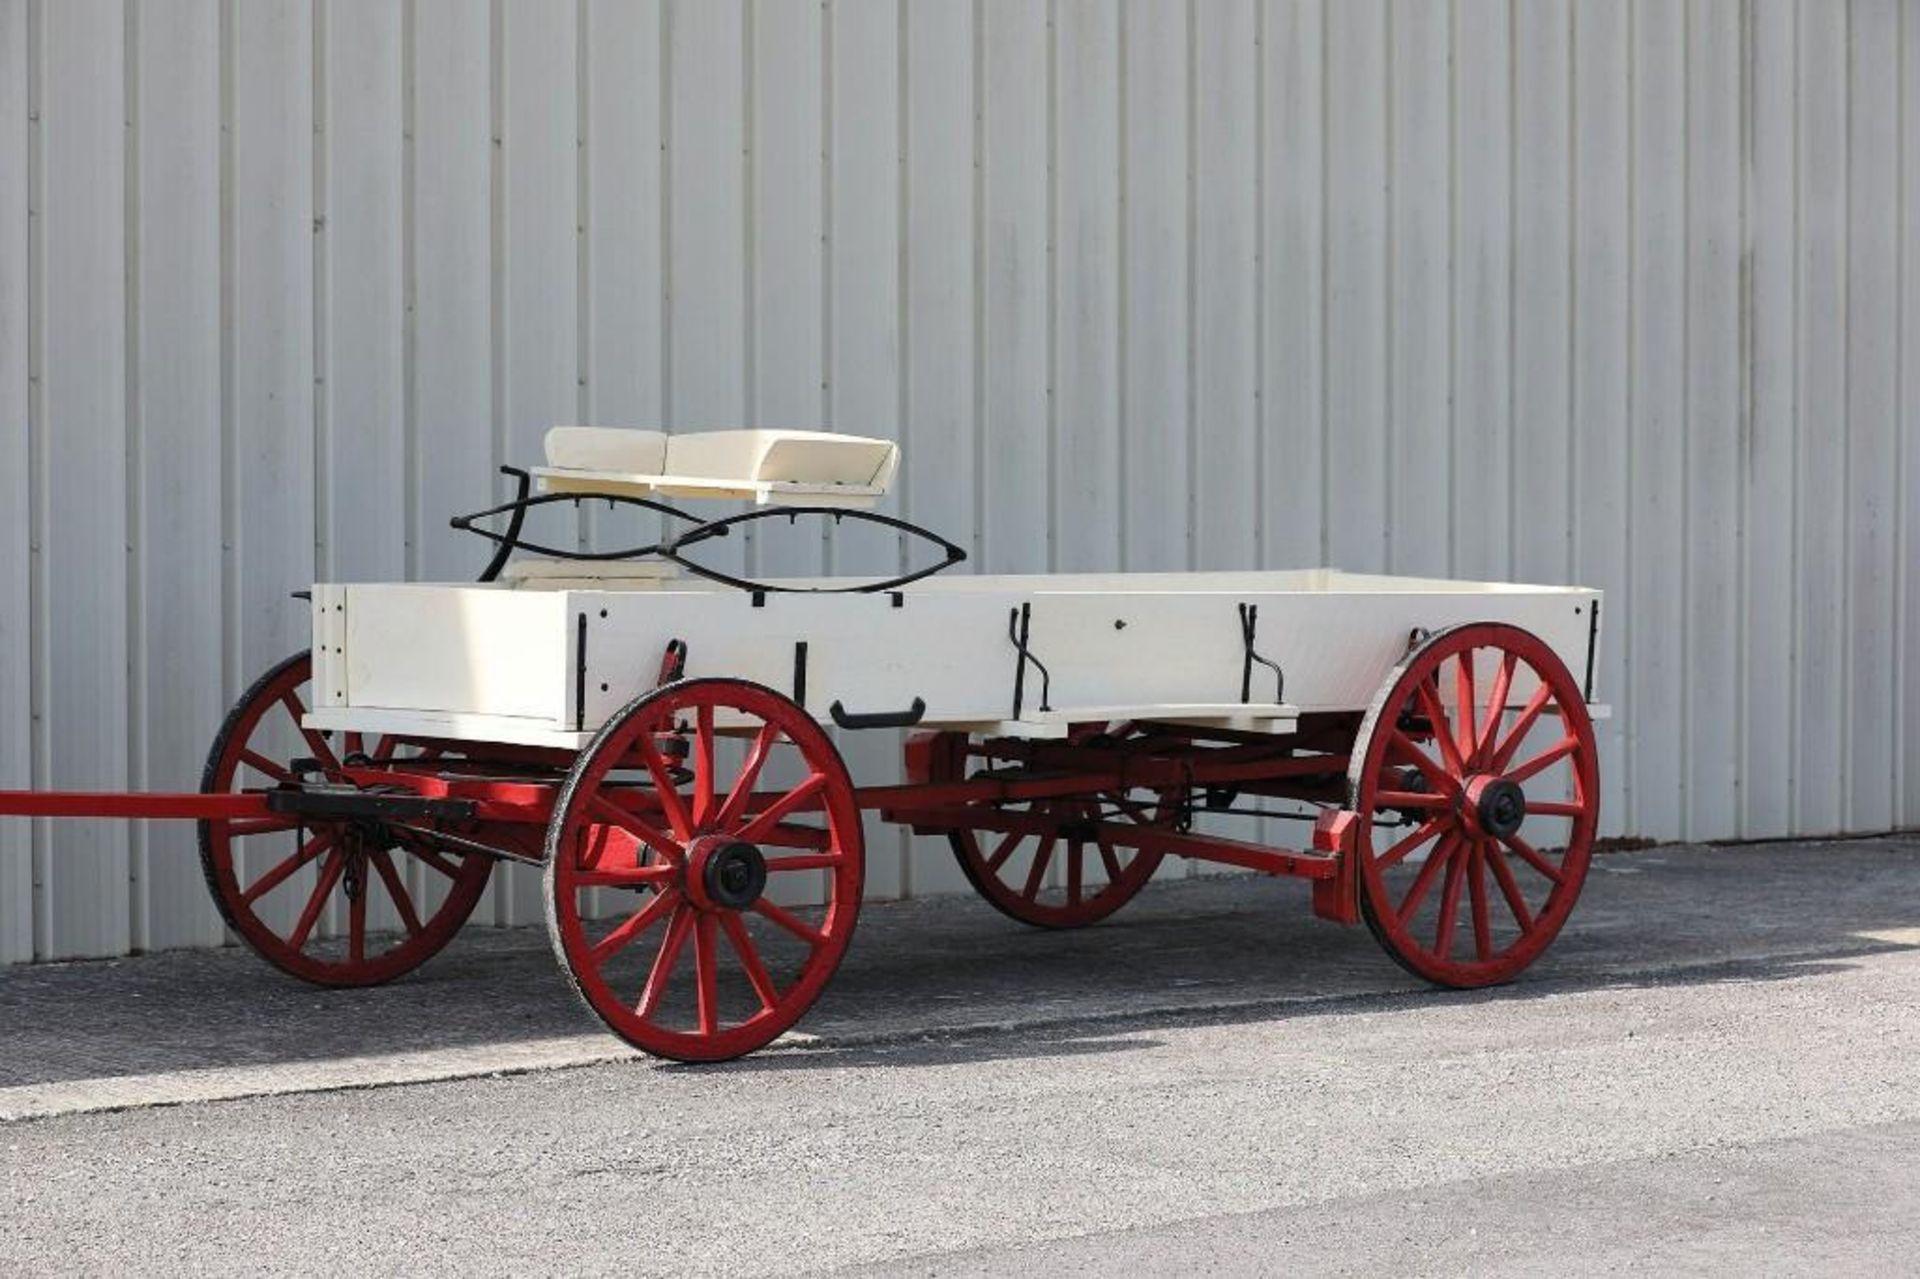 OWENSBORO Box Bed Farm Wagon, Original Plate - Image 2 of 2